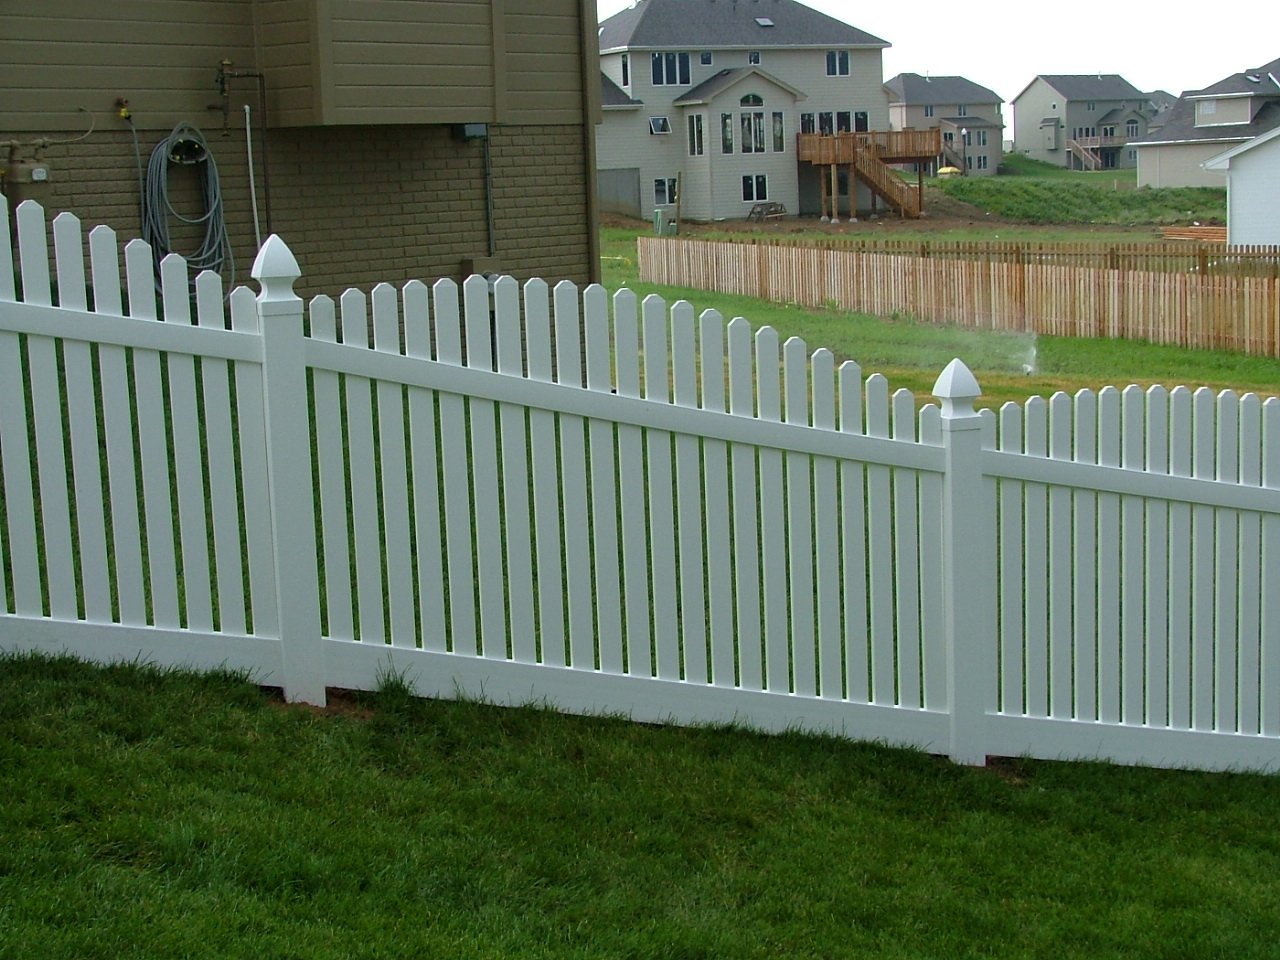 Dakota Fence & Deck 4' white pvc scalloped up picket - Omaha and Papillion, Nebraska